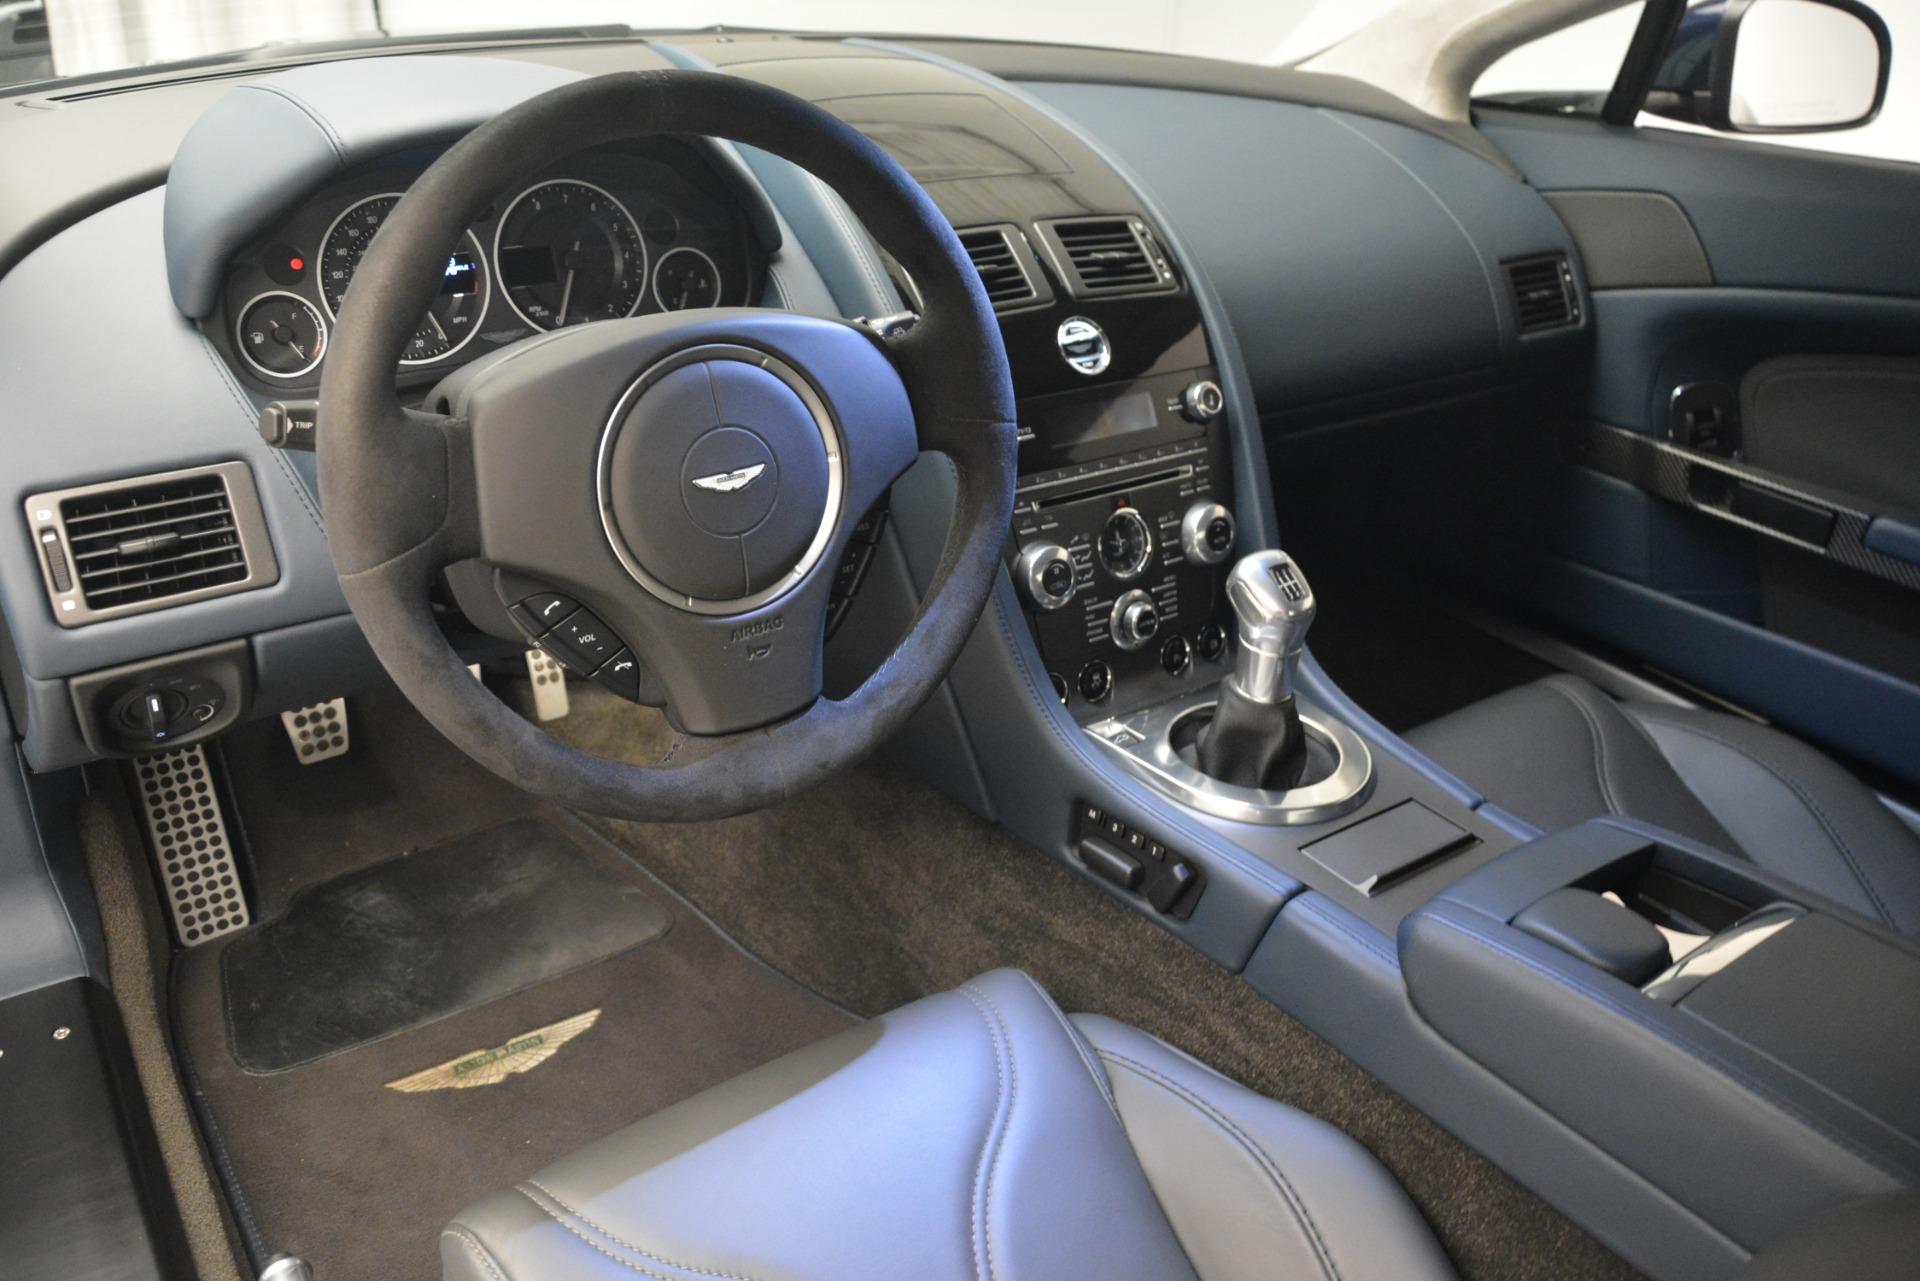 Used 2012 Aston Martin V12 Vantage  For Sale In Greenwich, CT 3046_p14